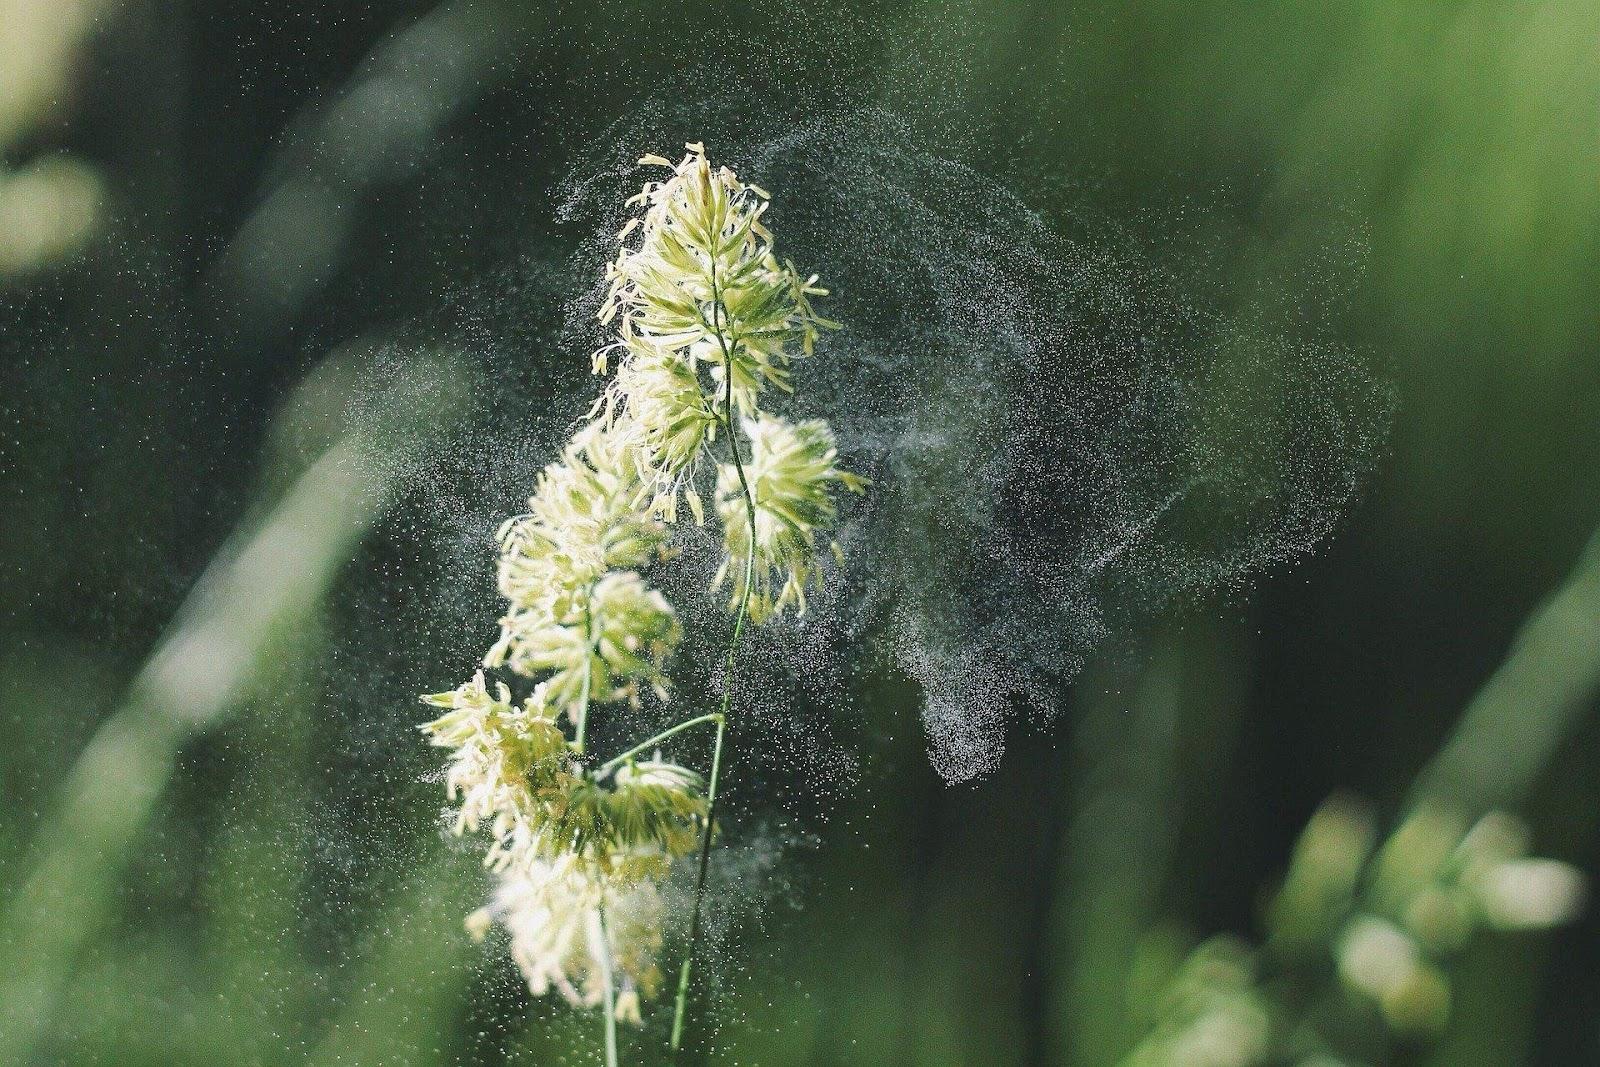 A plant spreading pollen